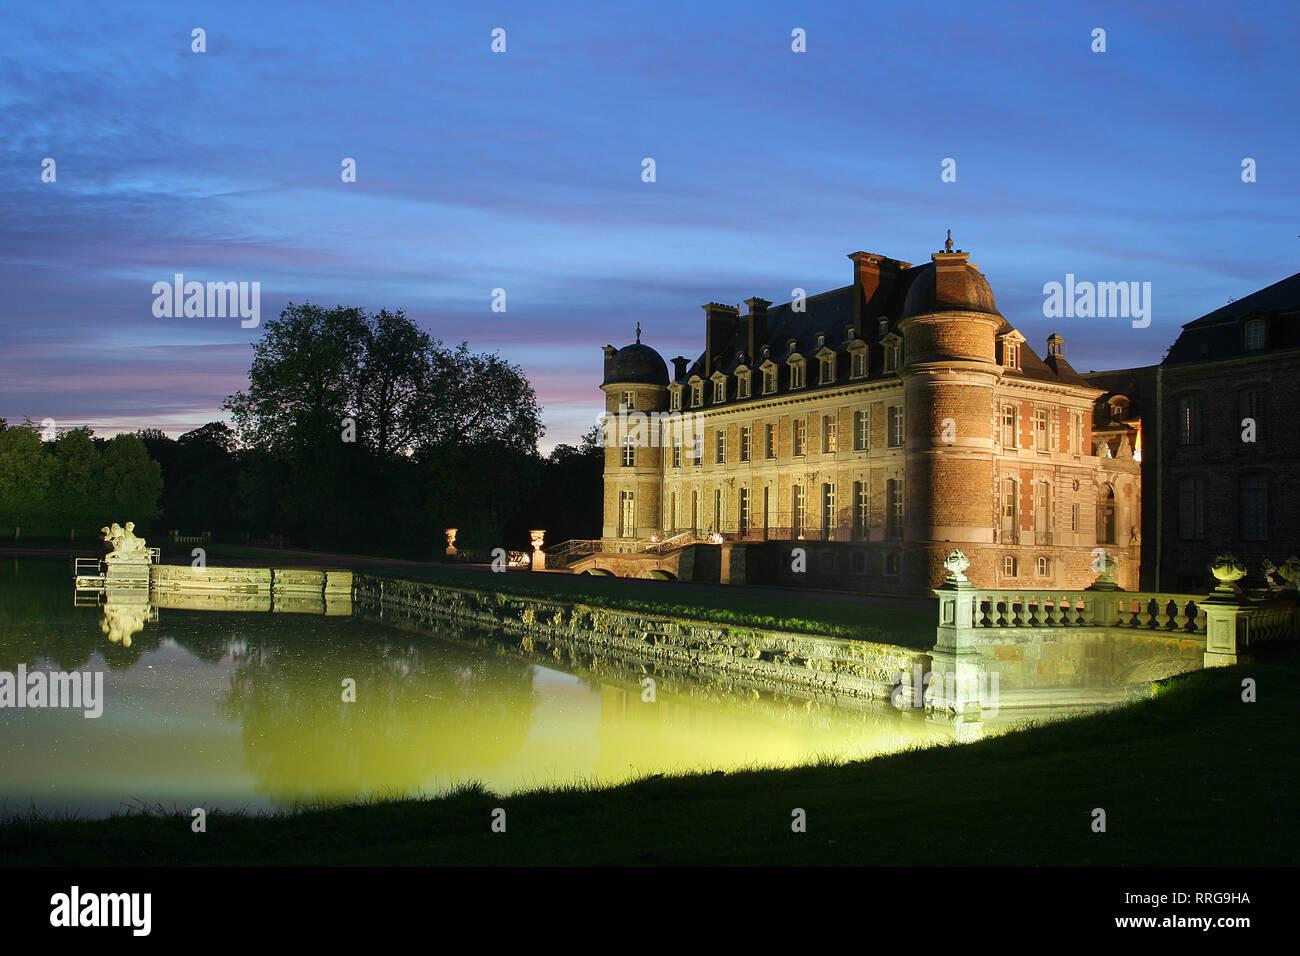 Beloeil Castle, Wallonia, Belgium, Europe - Stock Image